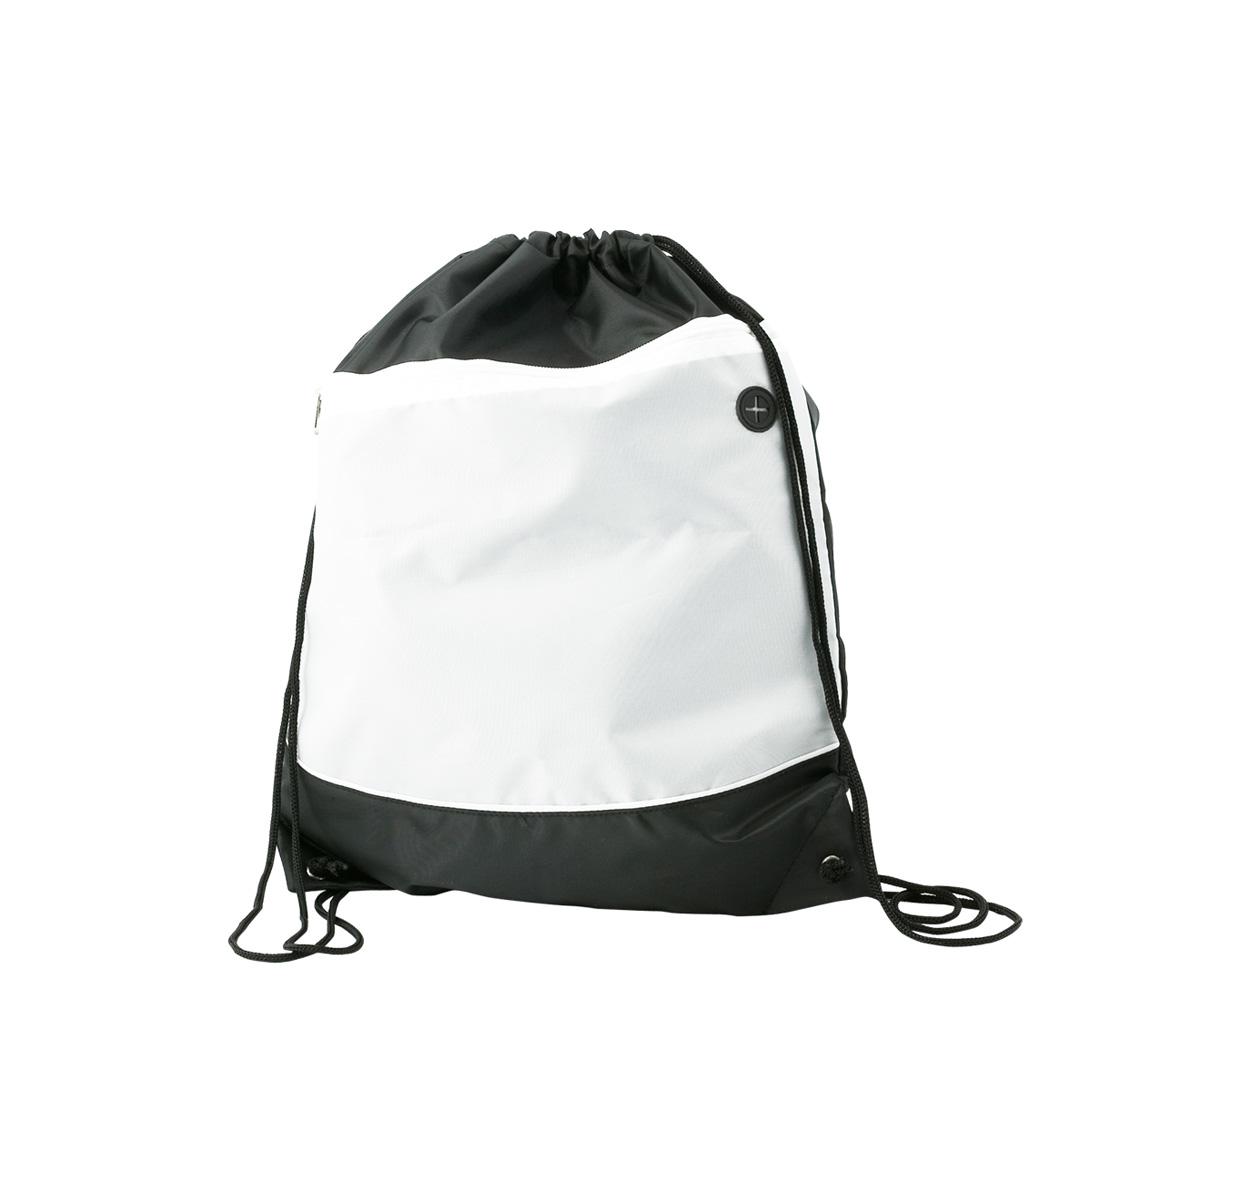 Cobra drawstring bag